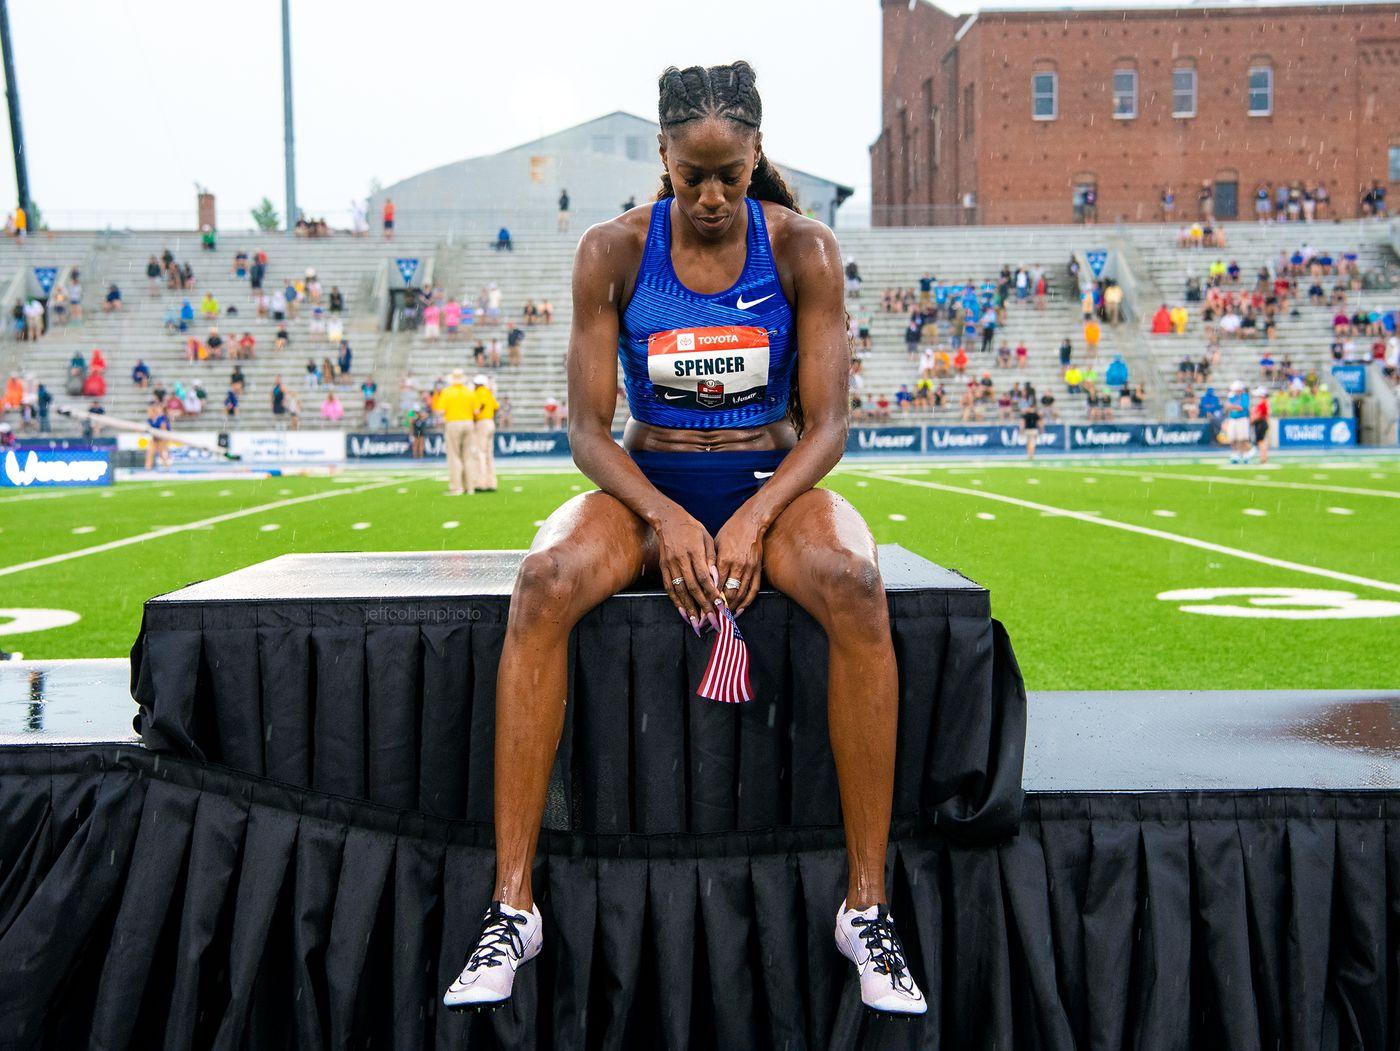 2019-USATF-Outdoor-Champs-day-4-spencer-400hw-6674---jeff-cohen-photo--web.jpg